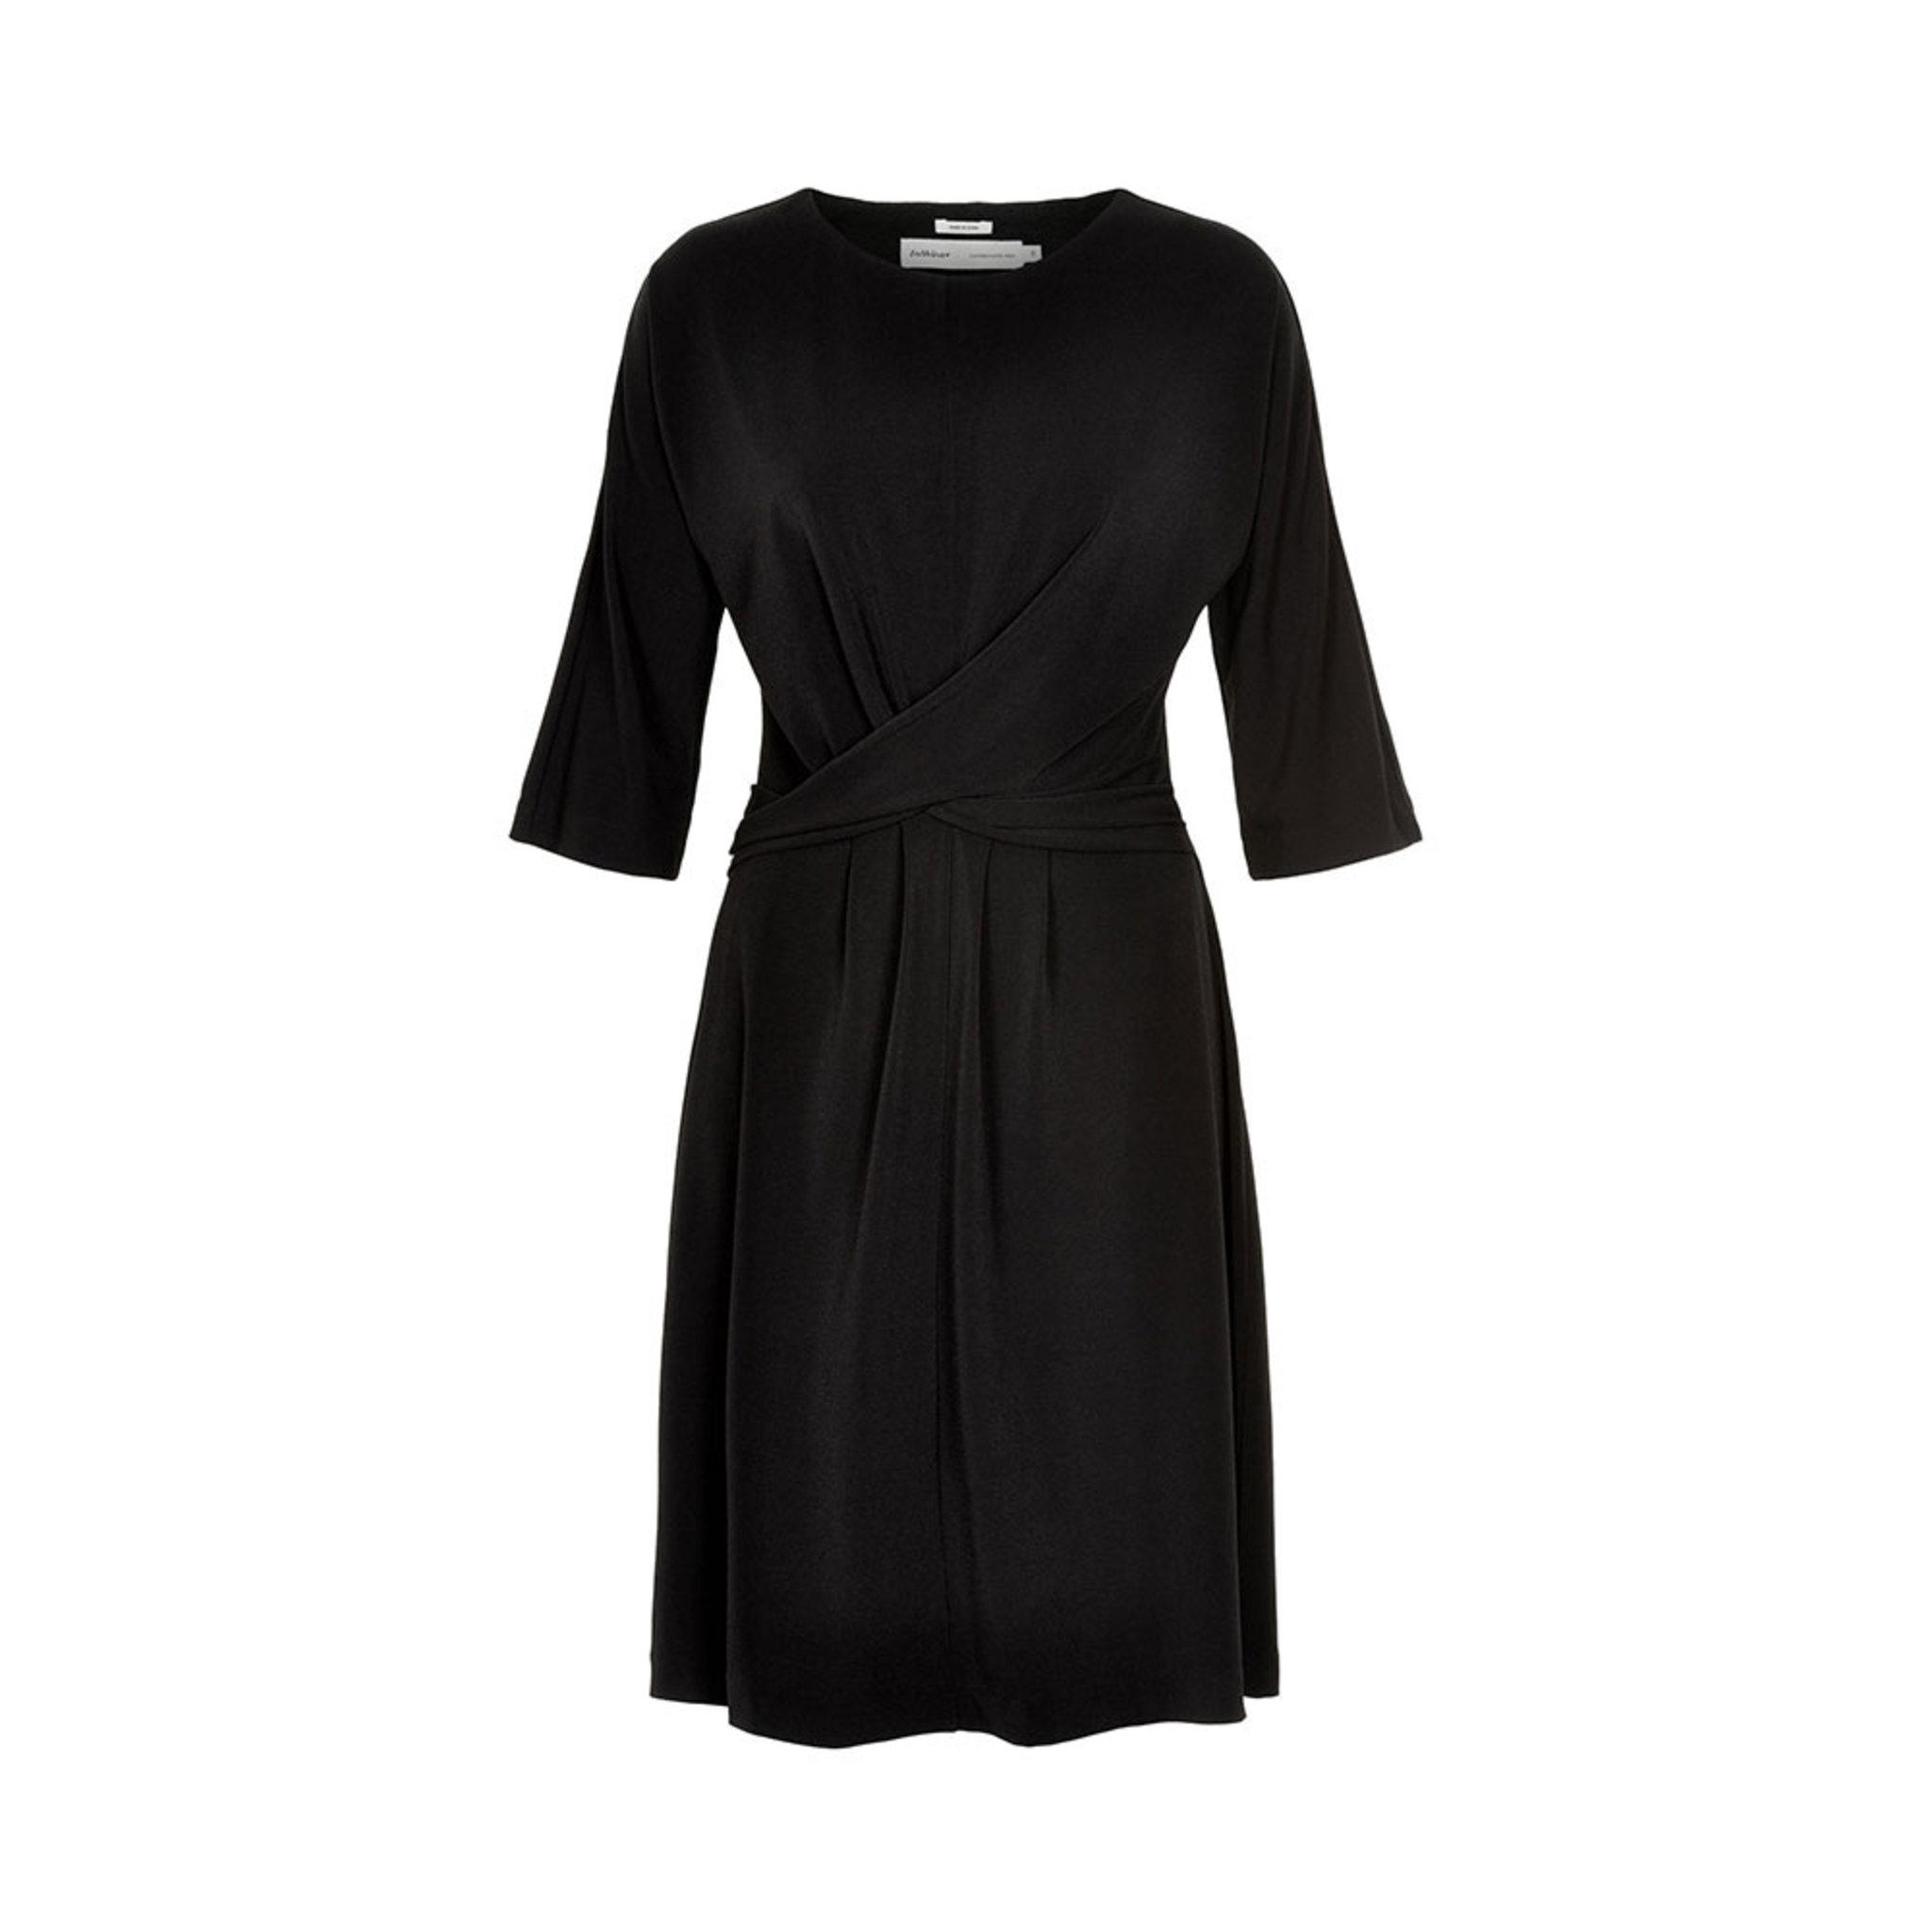 Vanja Dress - Fodralklänningar - Köp online på åhlens.se! 6a3a7199118d4